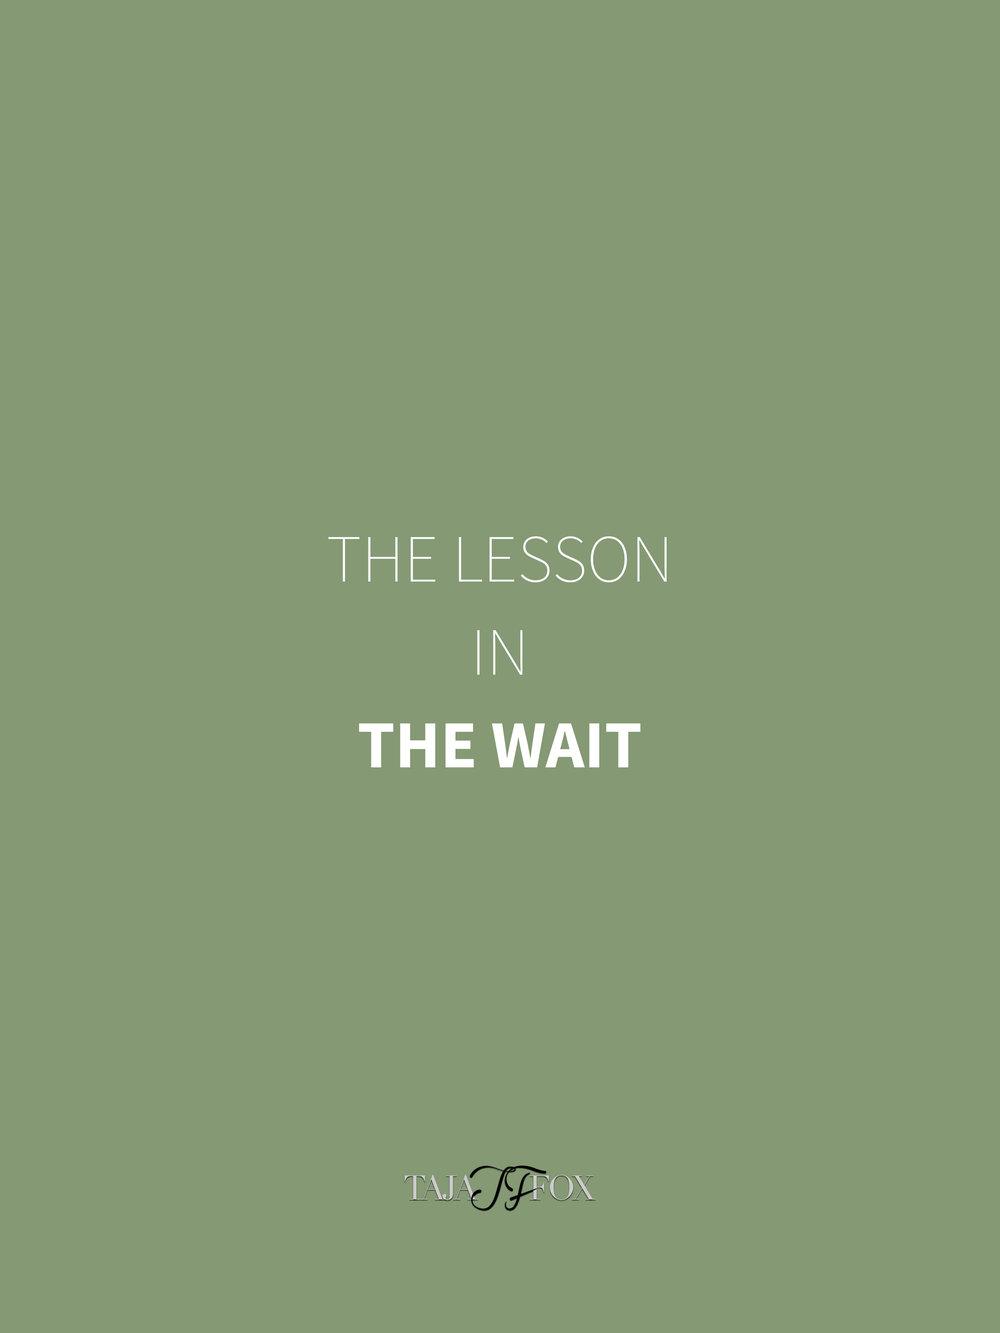 The Lesson tajafox.com.jpg